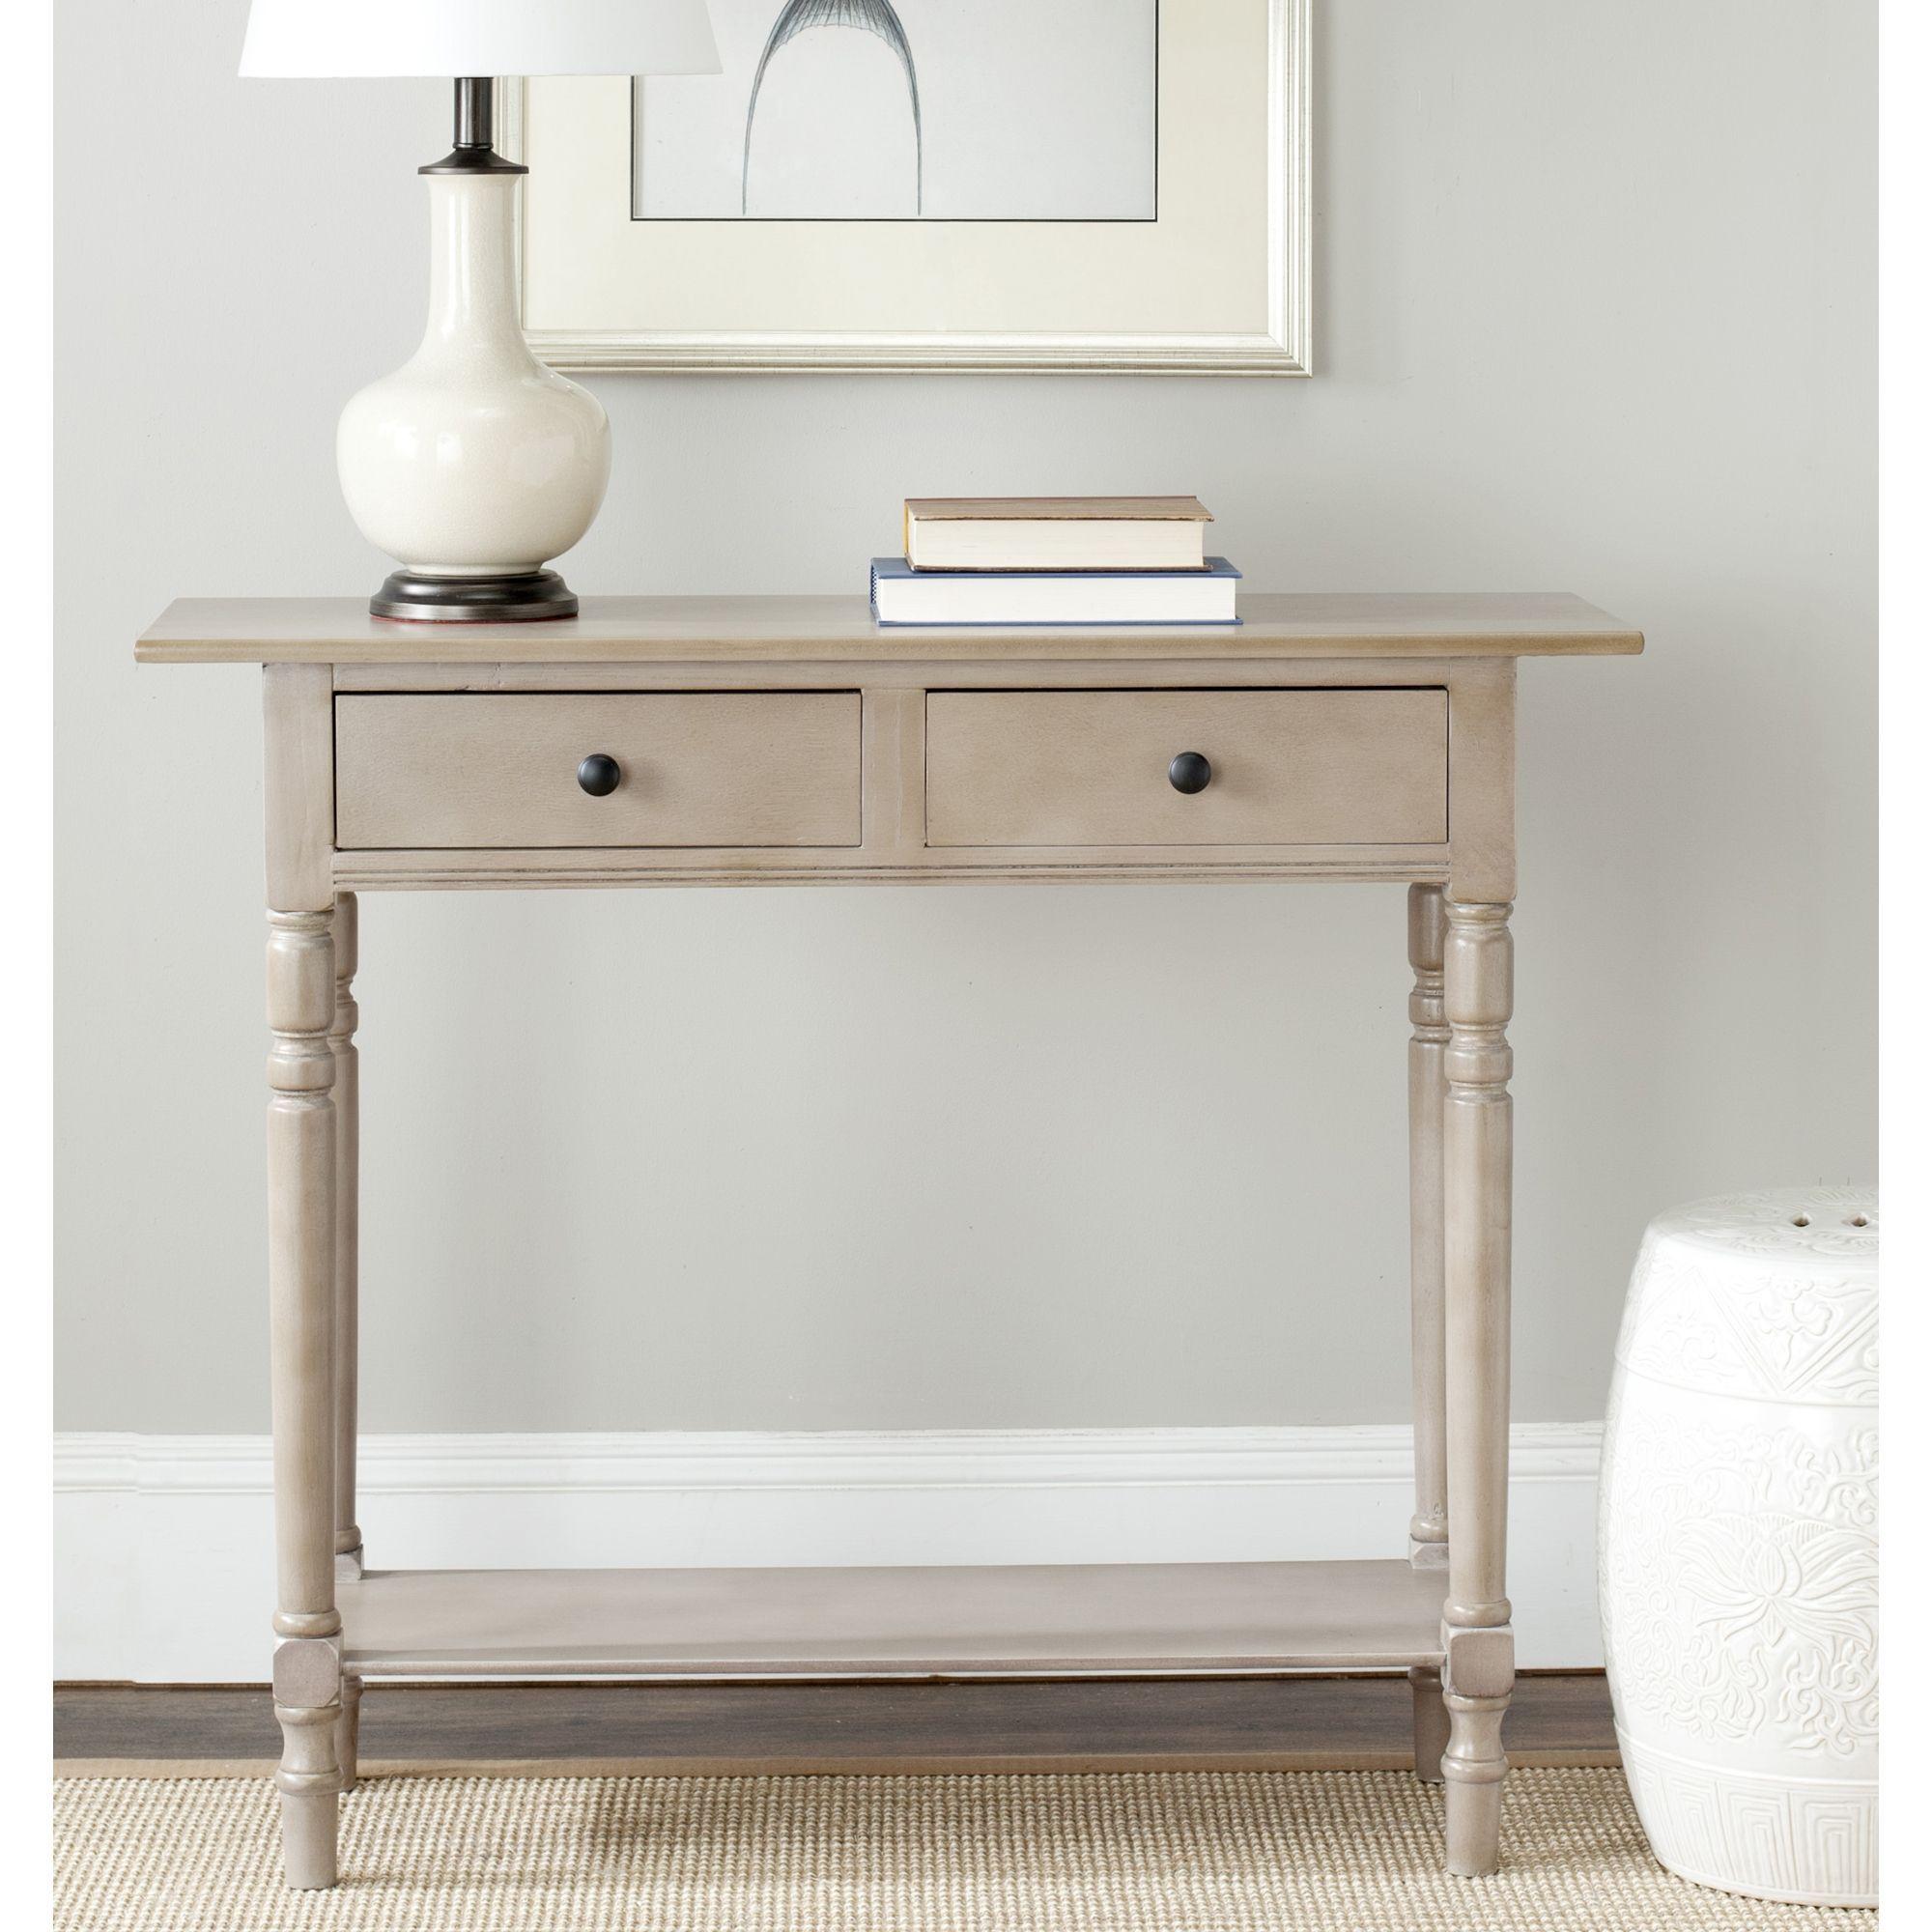 Braden 3 Drawer Console Table Entryway Cabinet Ballard Designs Decor